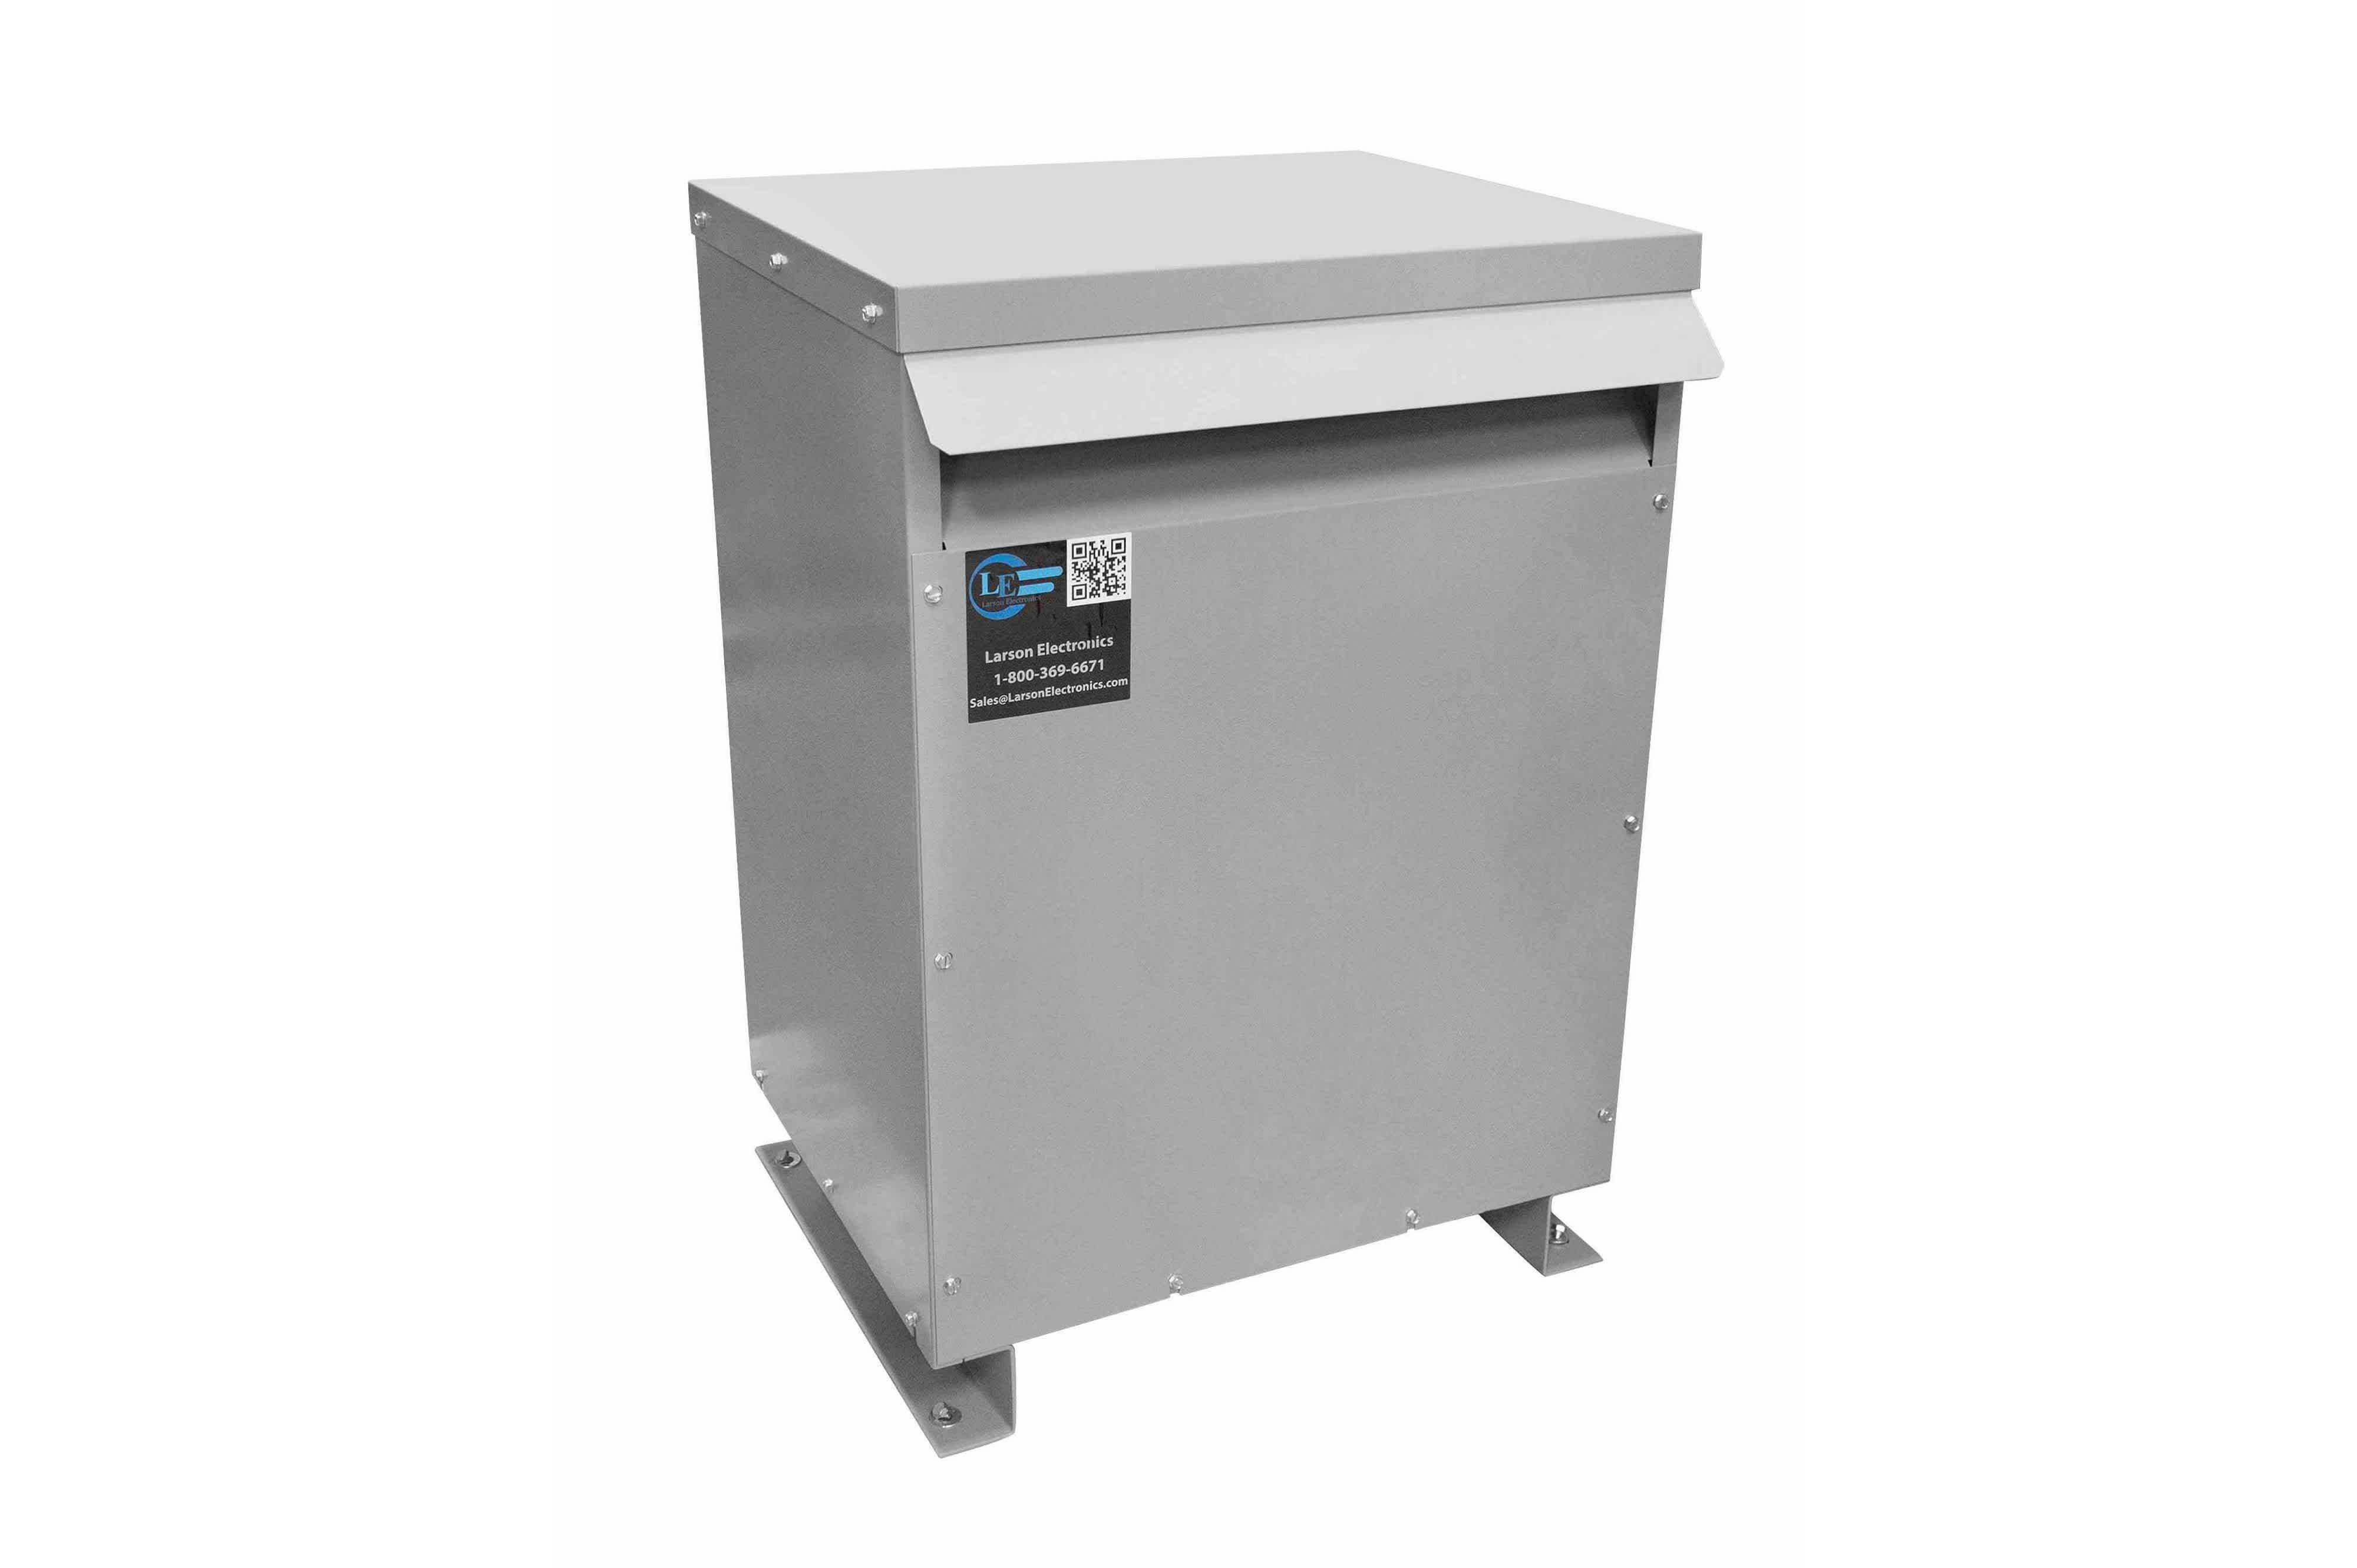 80 kVA 3PH DOE Transformer, 600V Delta Primary, 415Y/240 Wye-N Secondary, N3R, Ventilated, 60 Hz